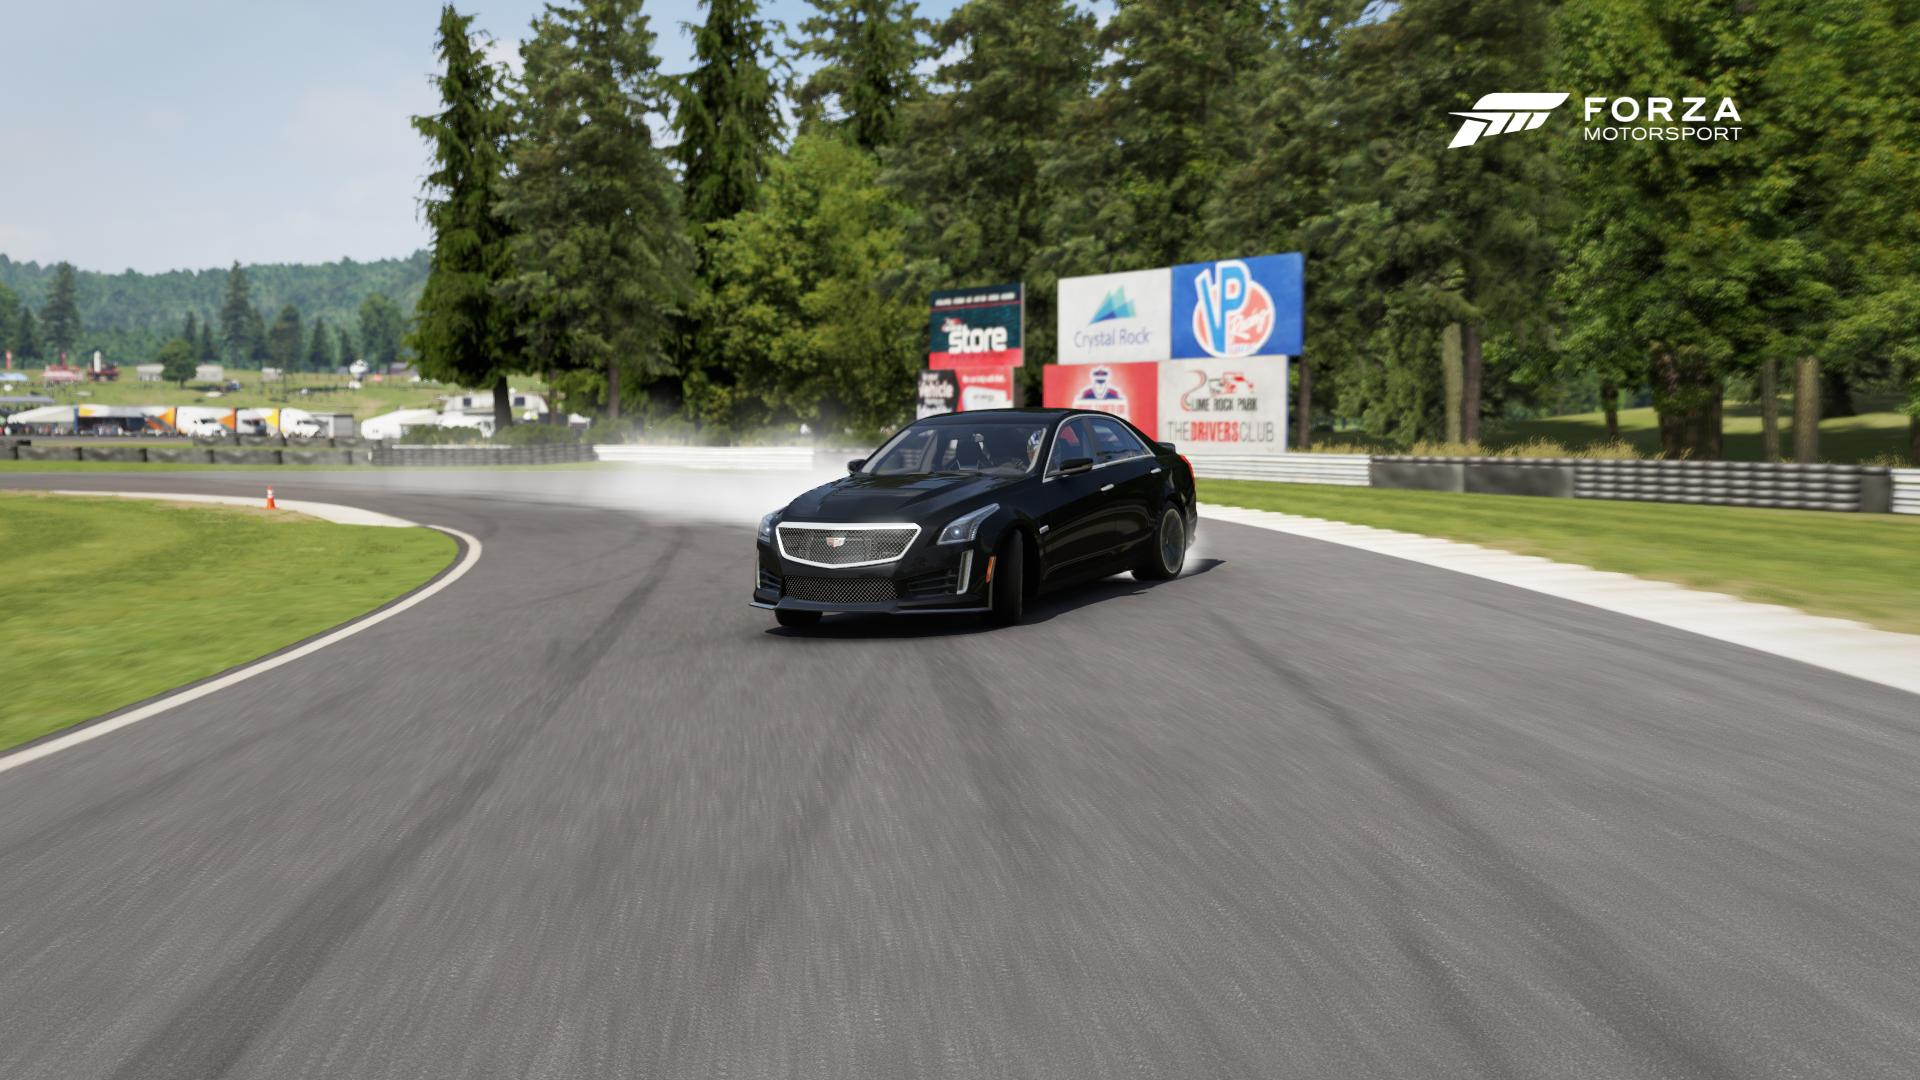 Forza Motorsport 6 (13).png